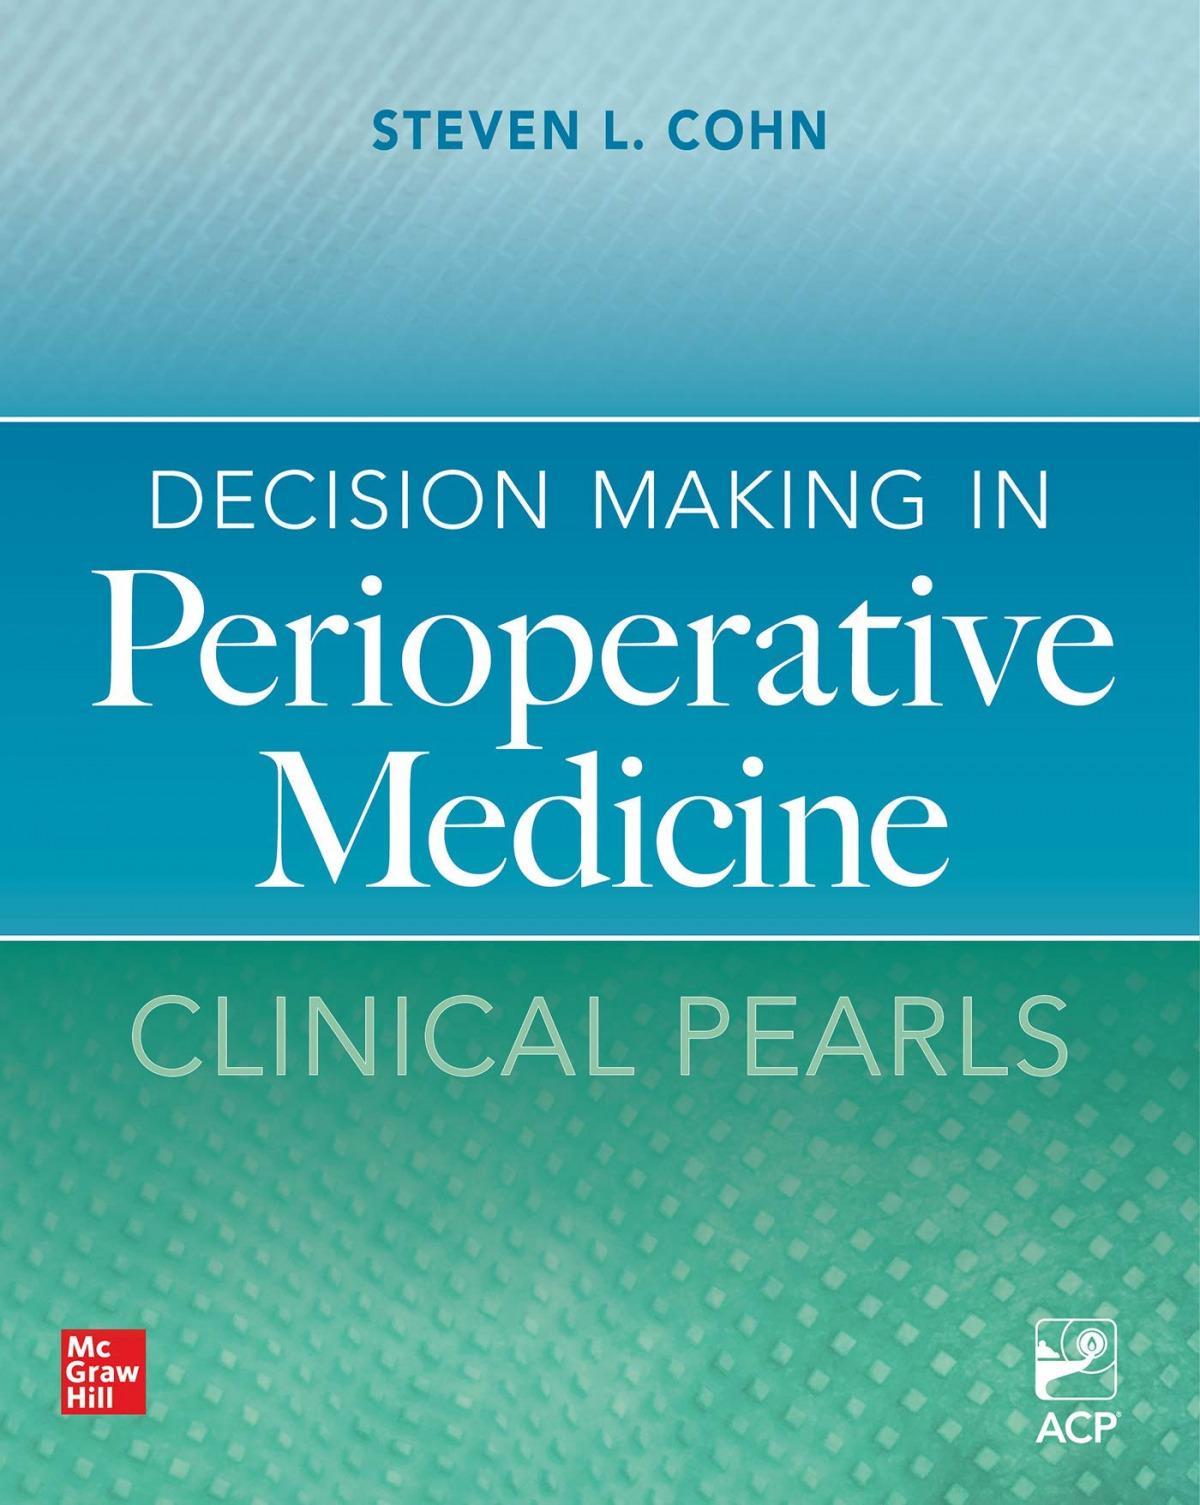 DECISION MAKING IN PERIOPERATIVE MEDICINE:CLINICAL PEARLS